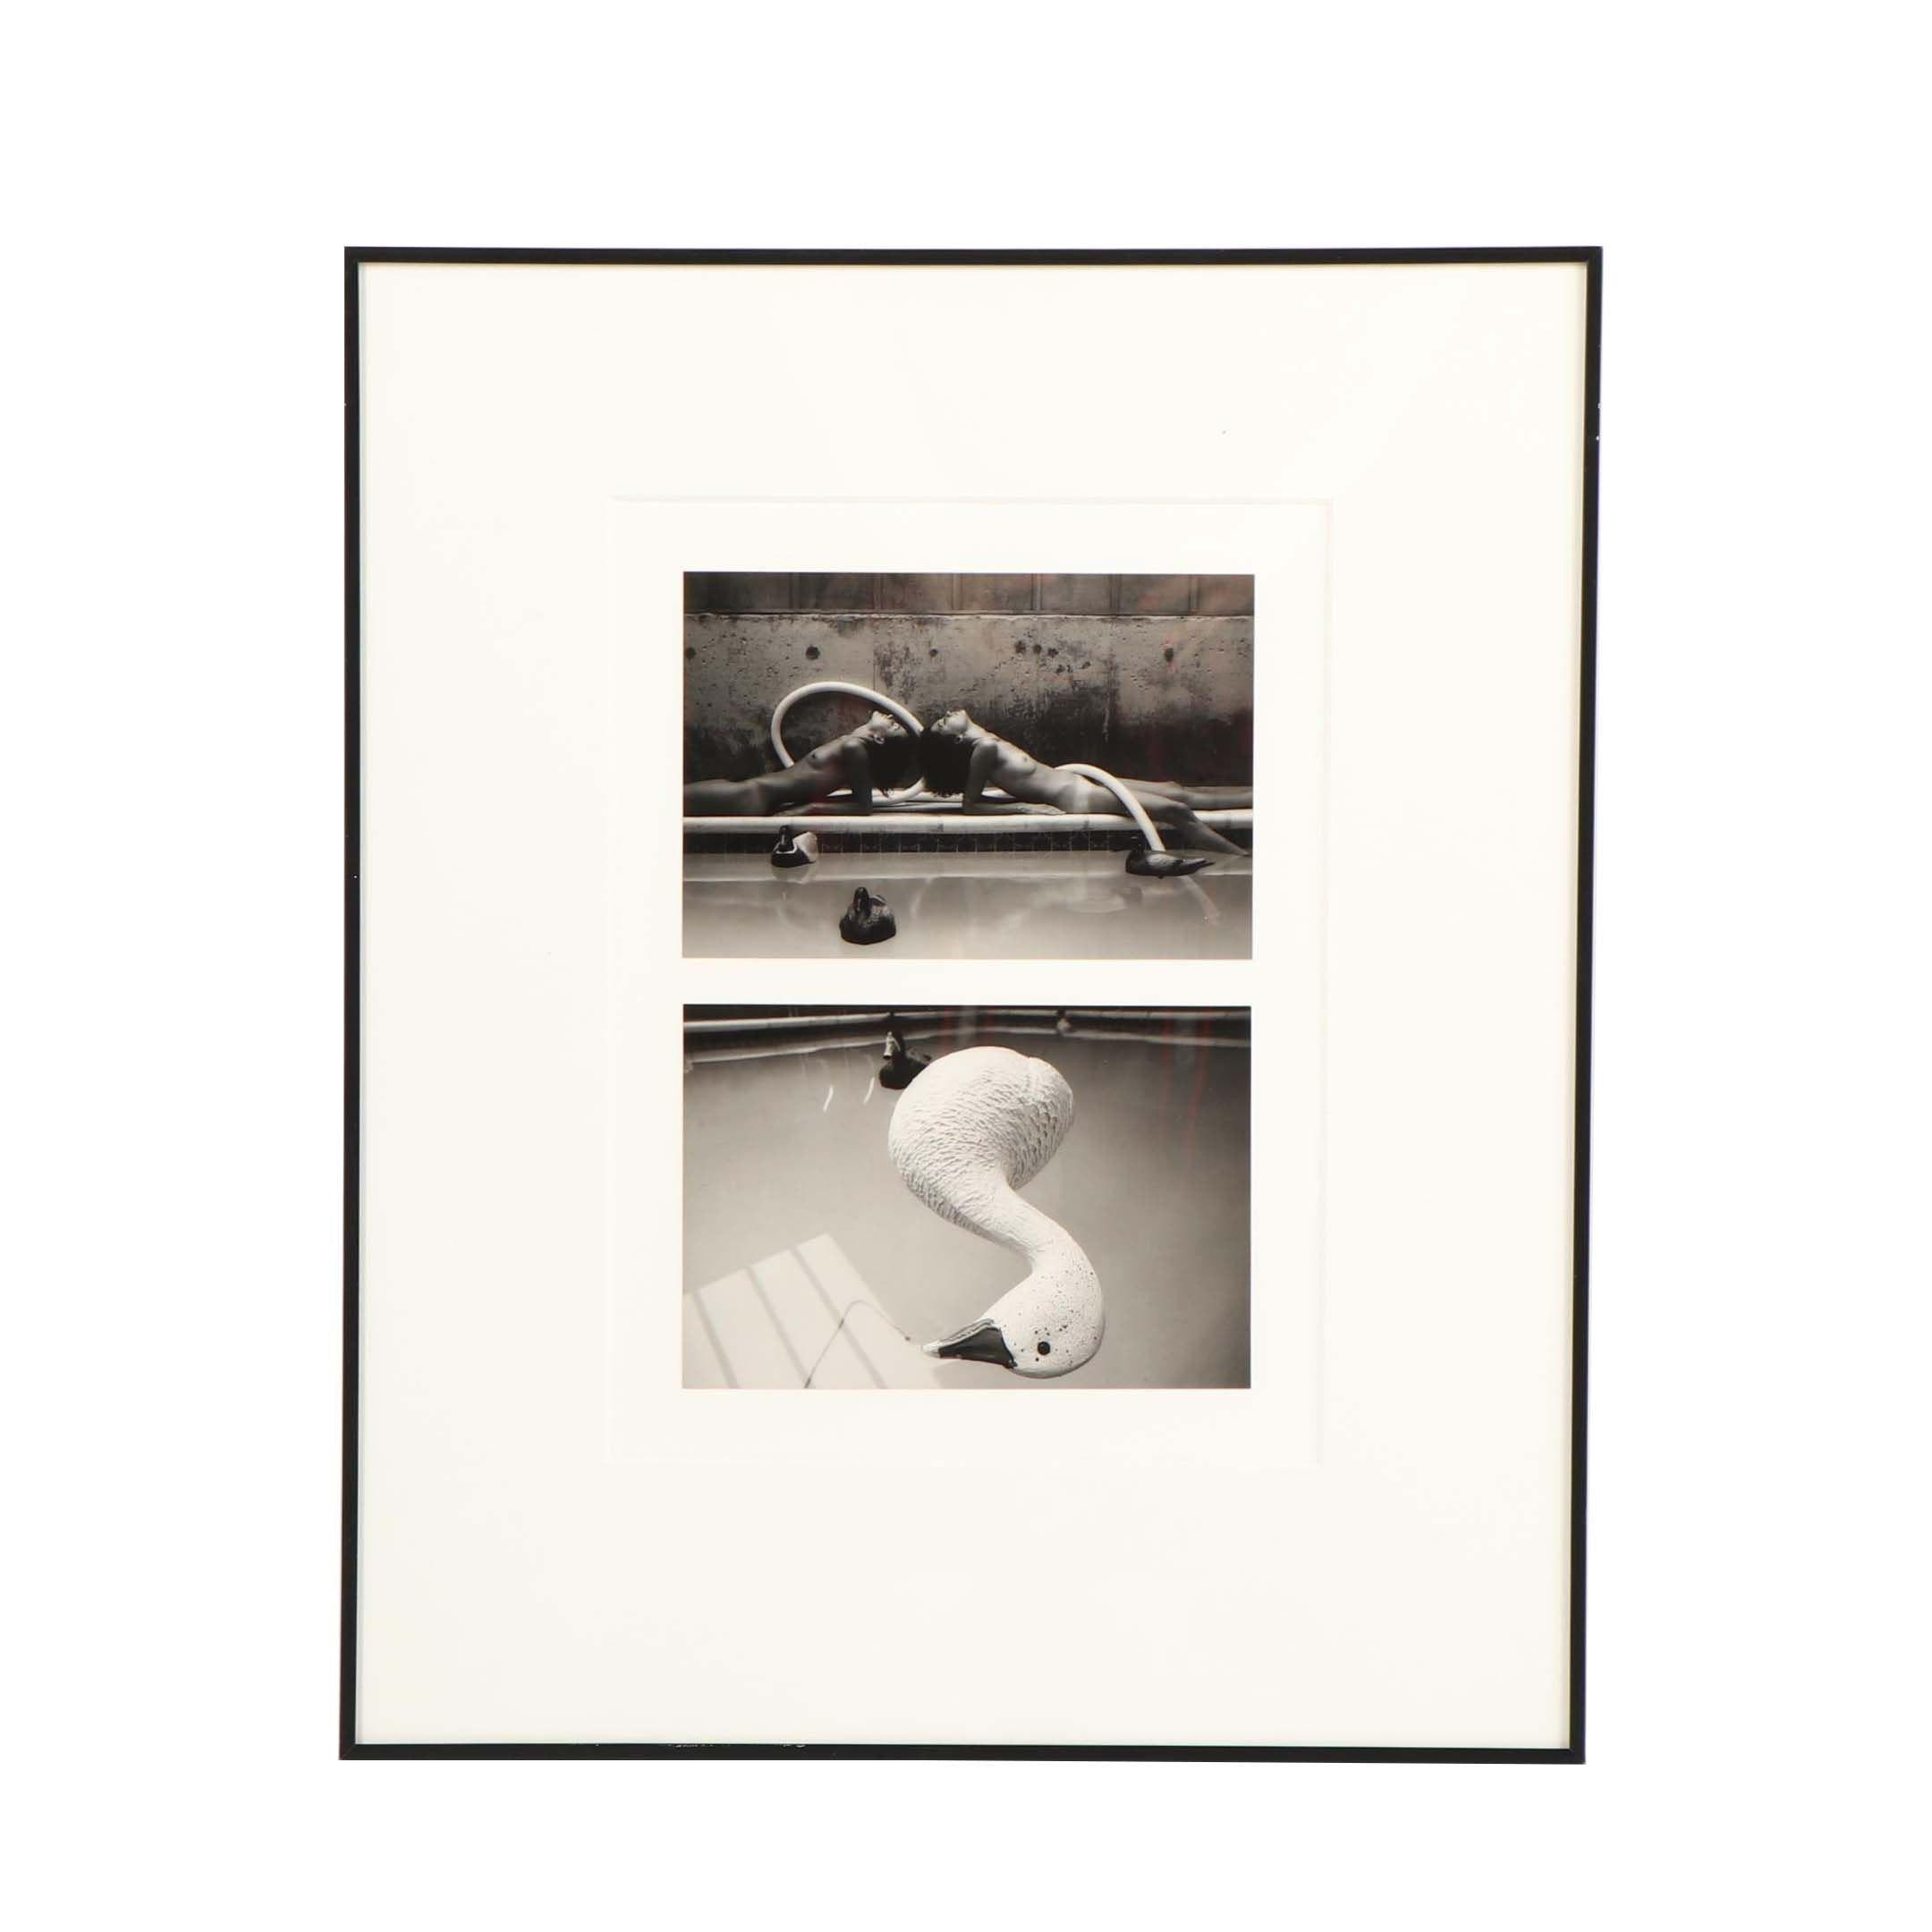 "Marsha Burns Gelatin Silver Photograph ""# 17 Snowgoose Fantasy Sequence"""